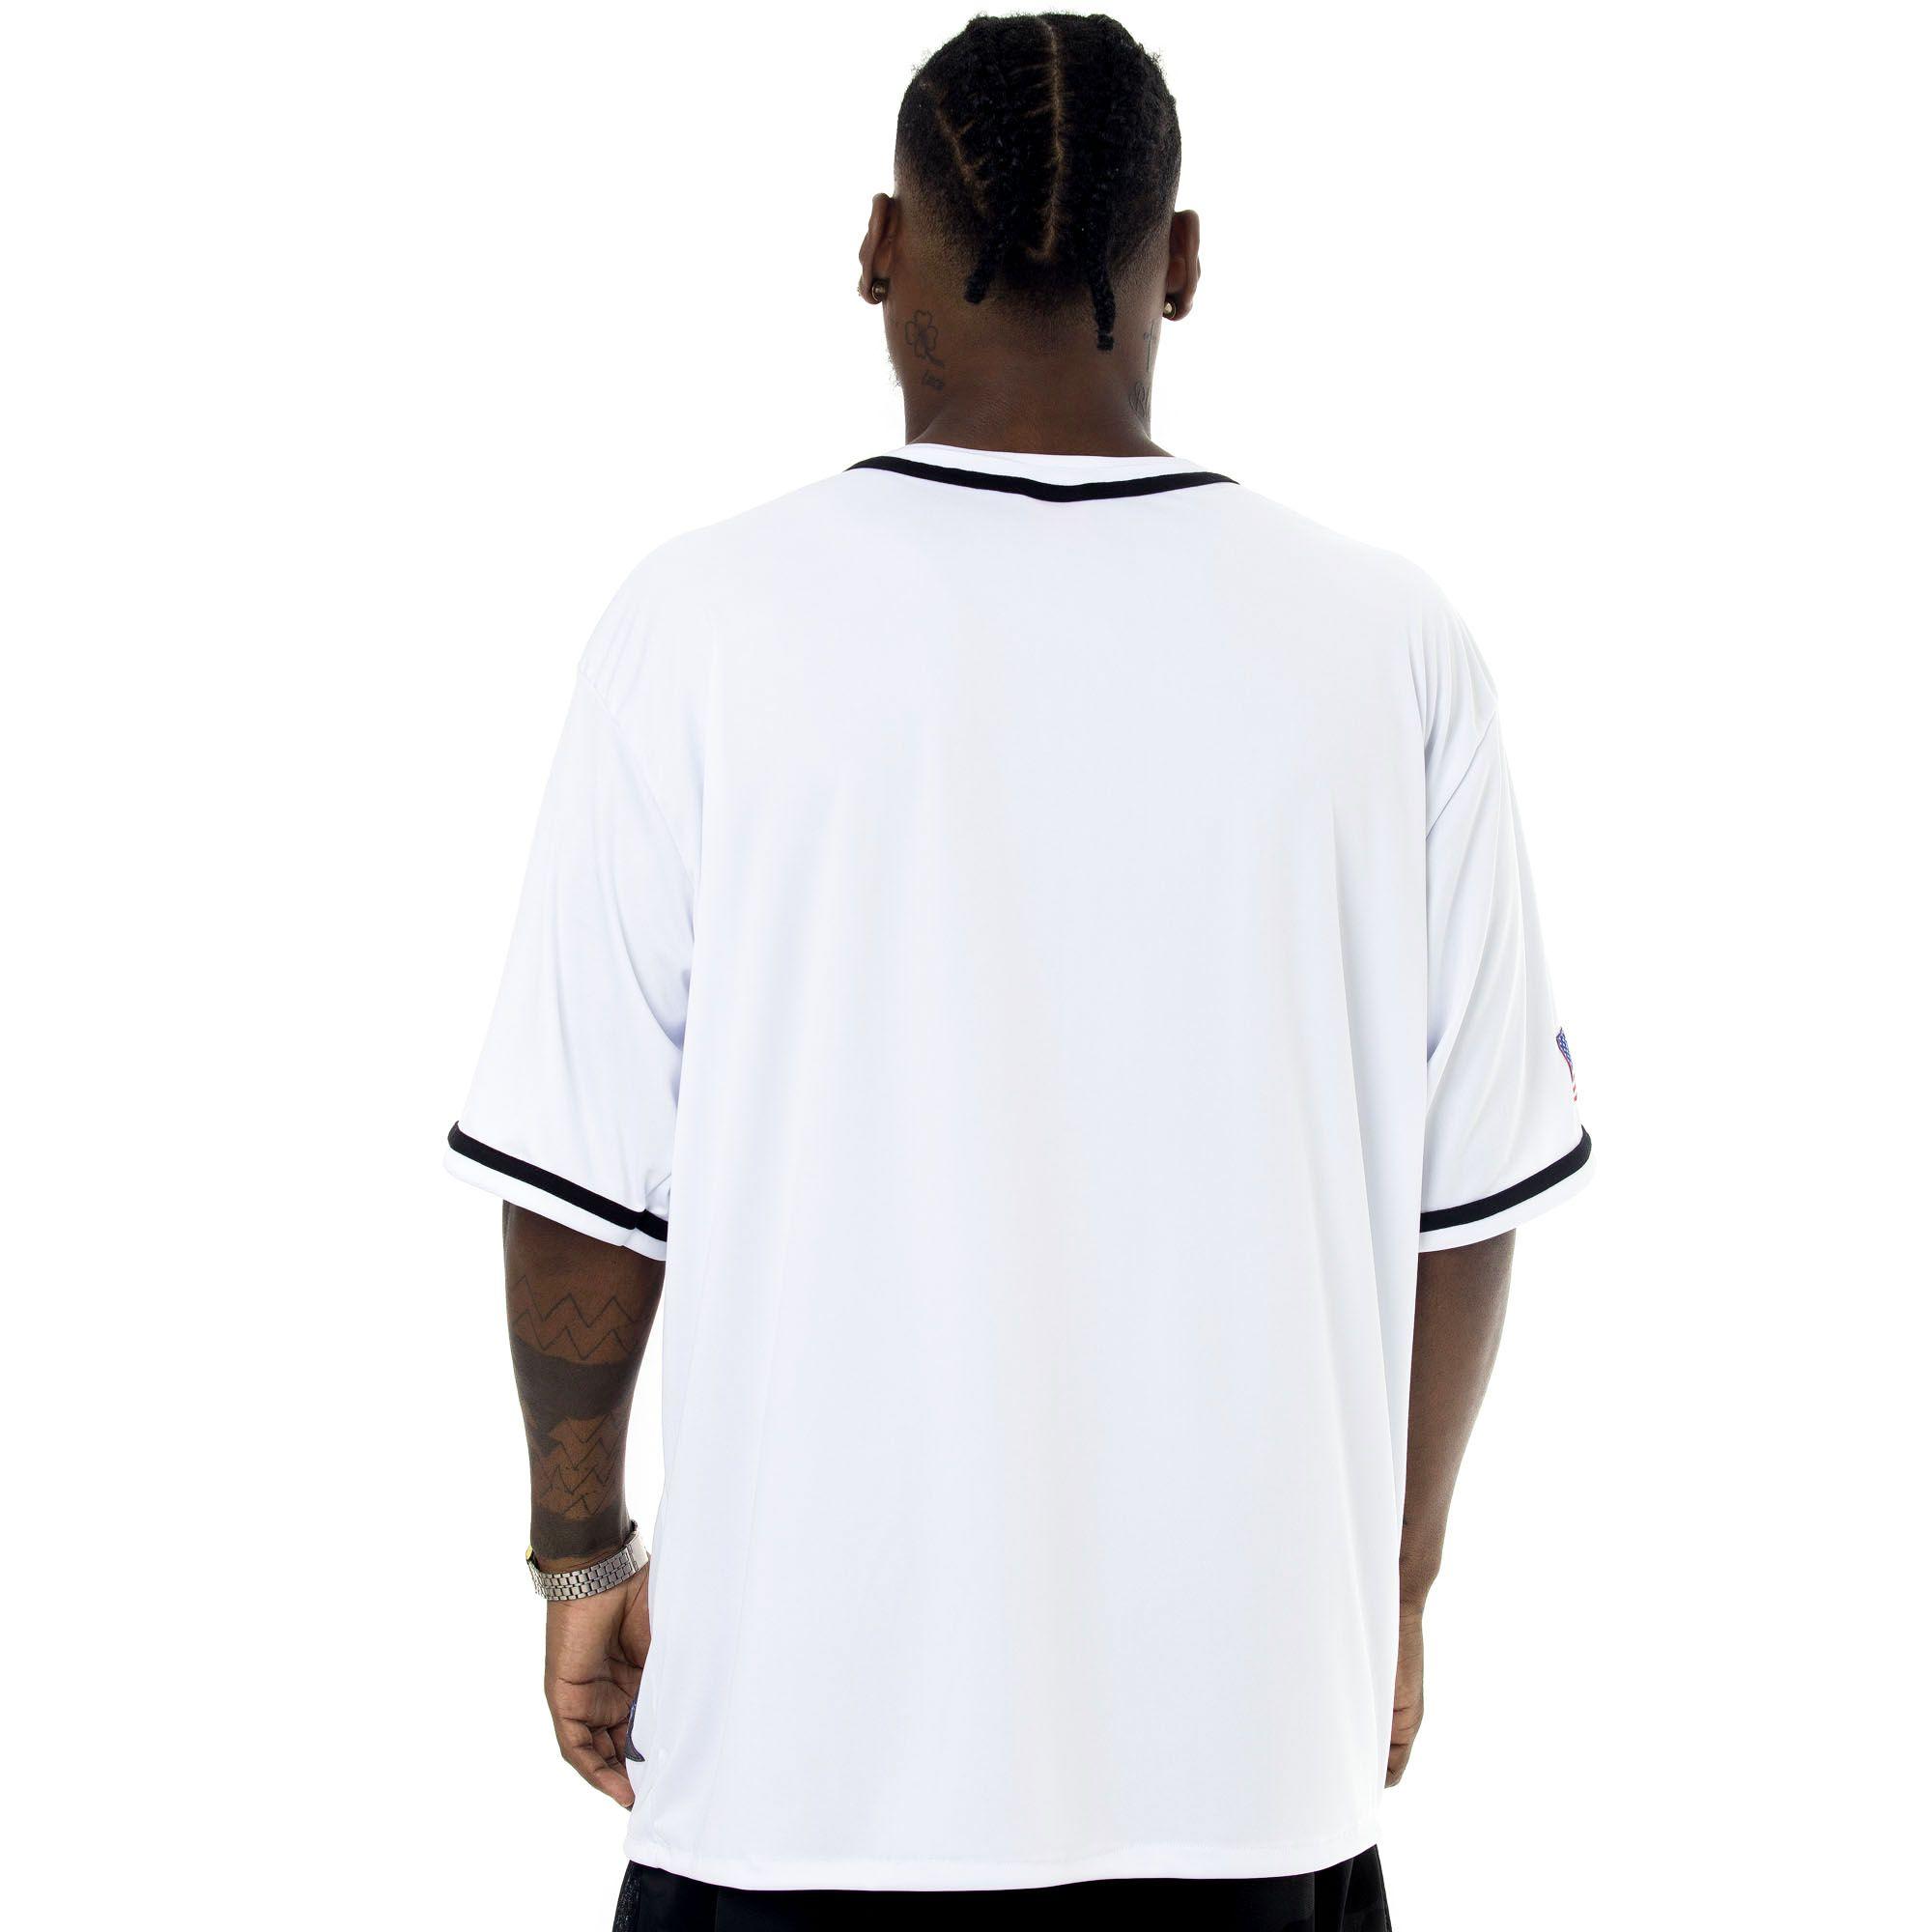 Camisa de Baseball Prison Street 08 Branca